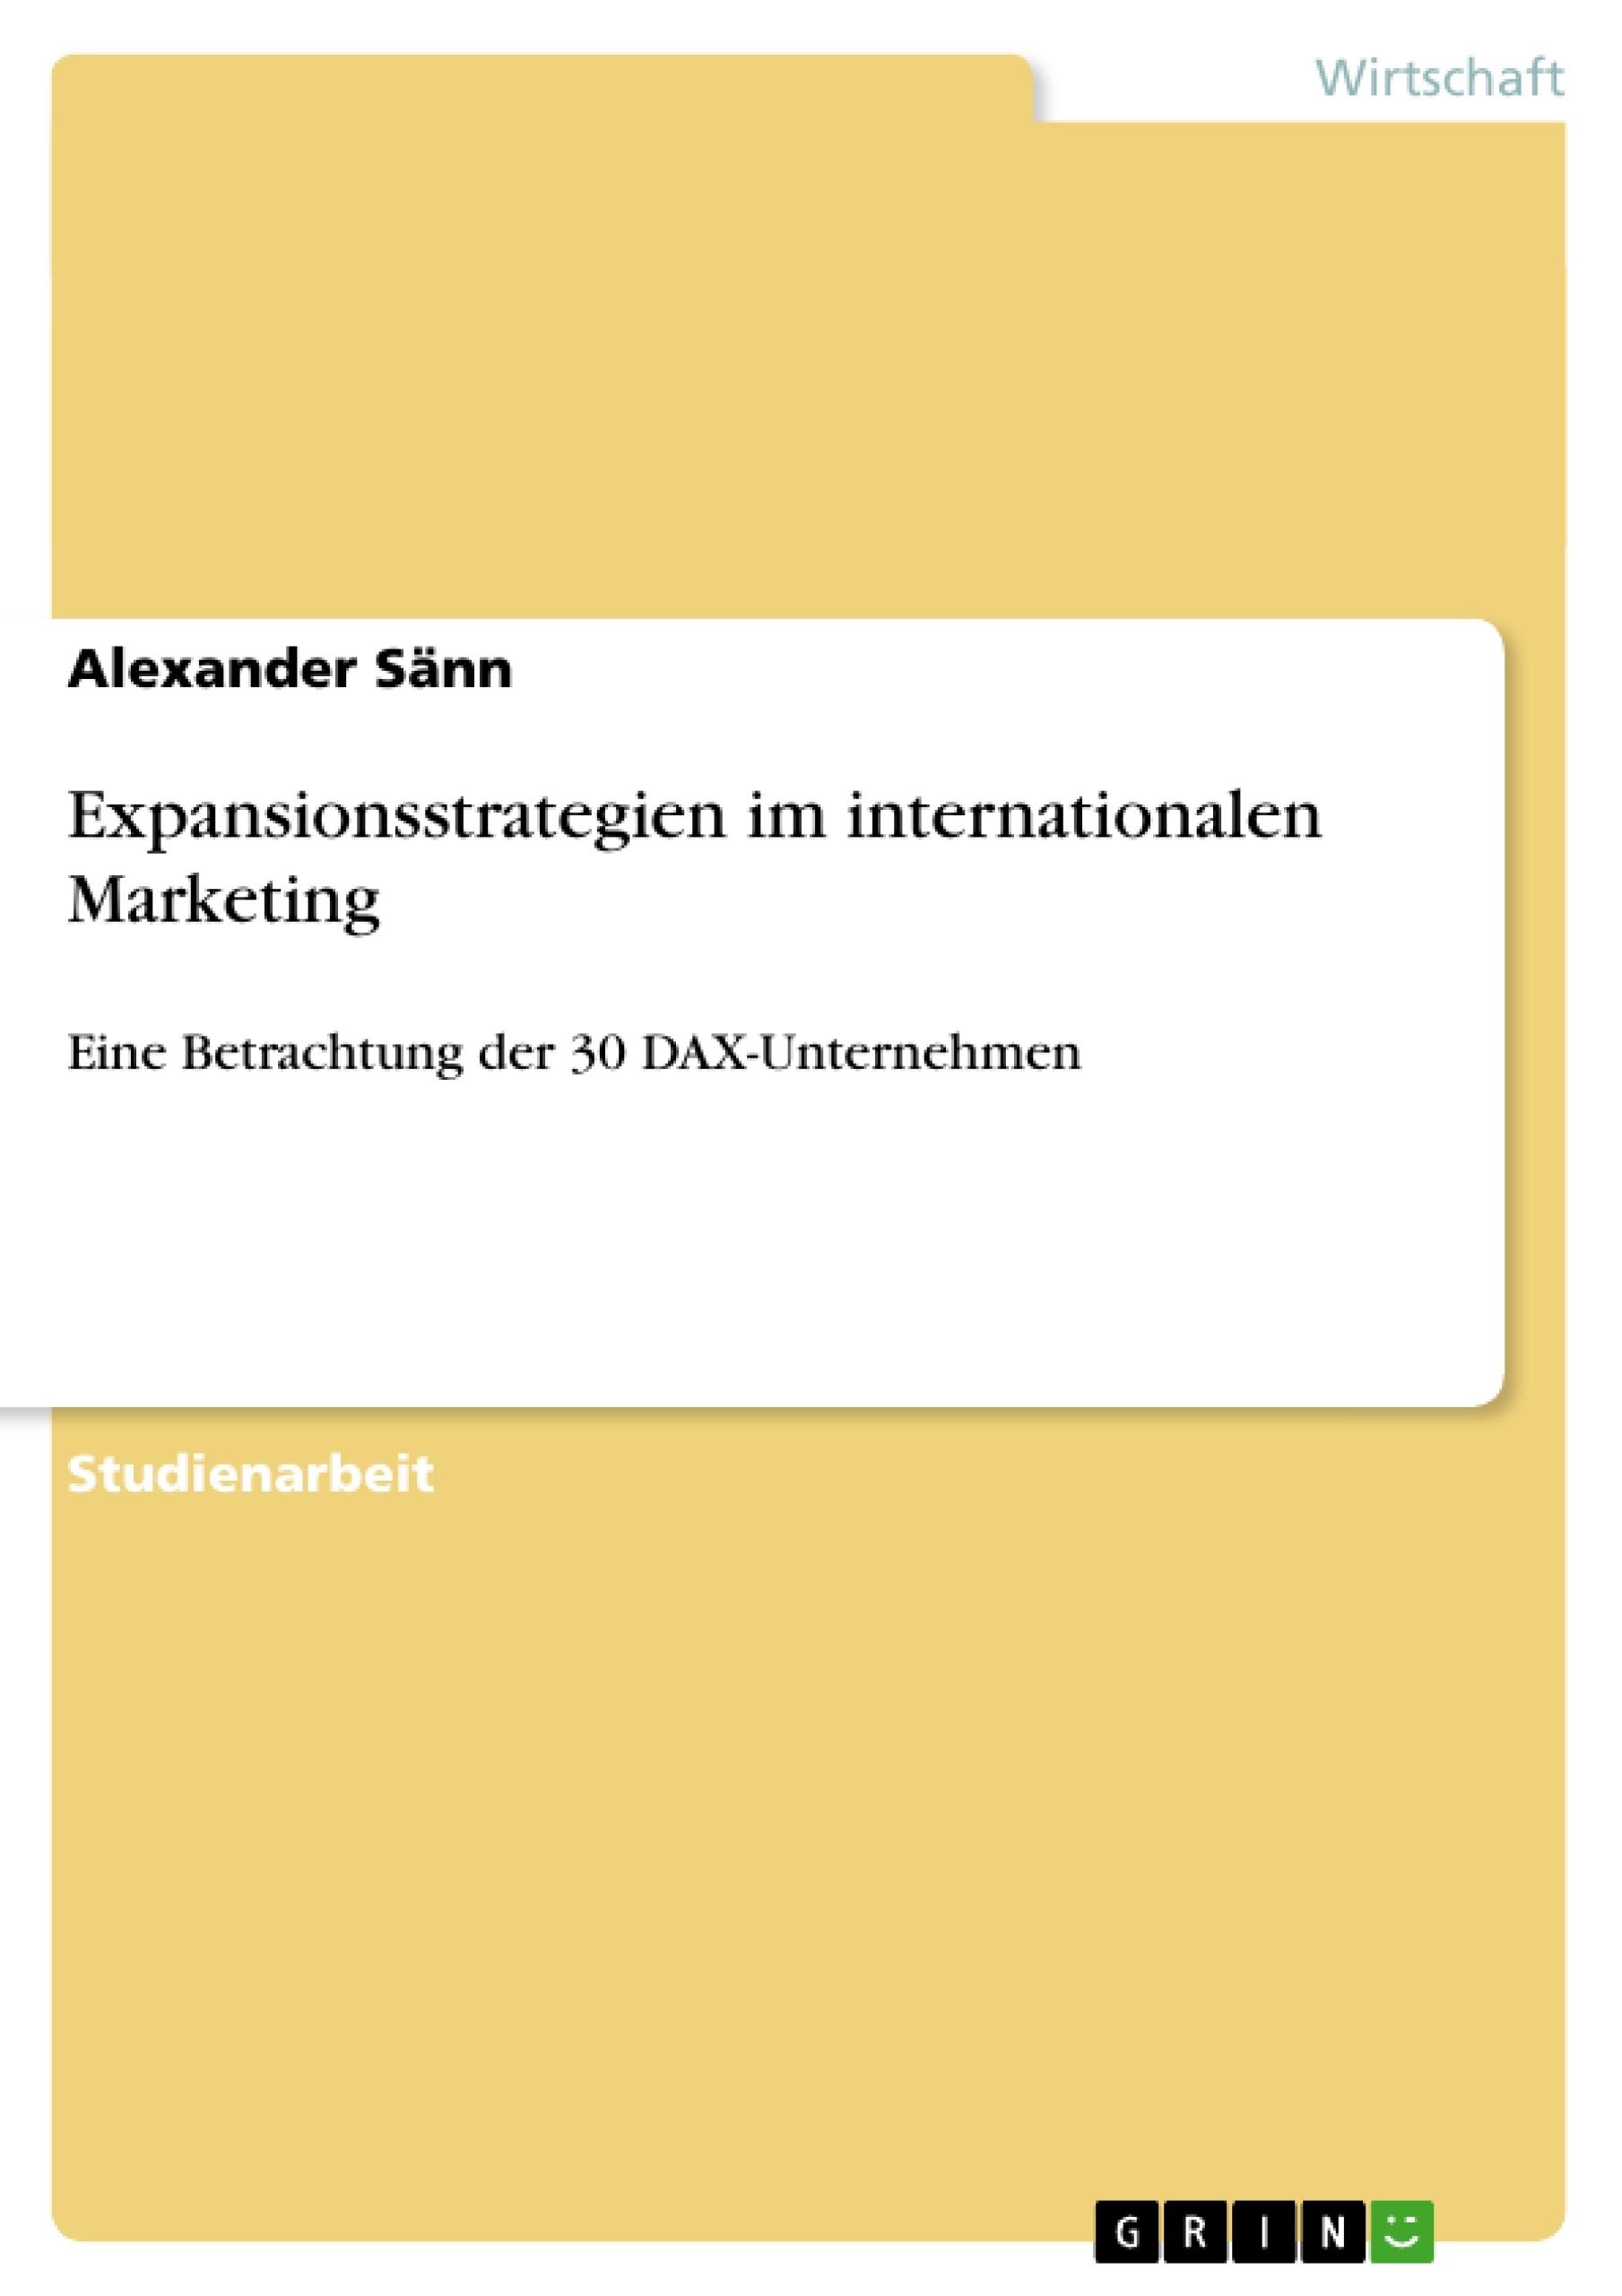 Titel: Expansionsstrategien im internationalen Marketing